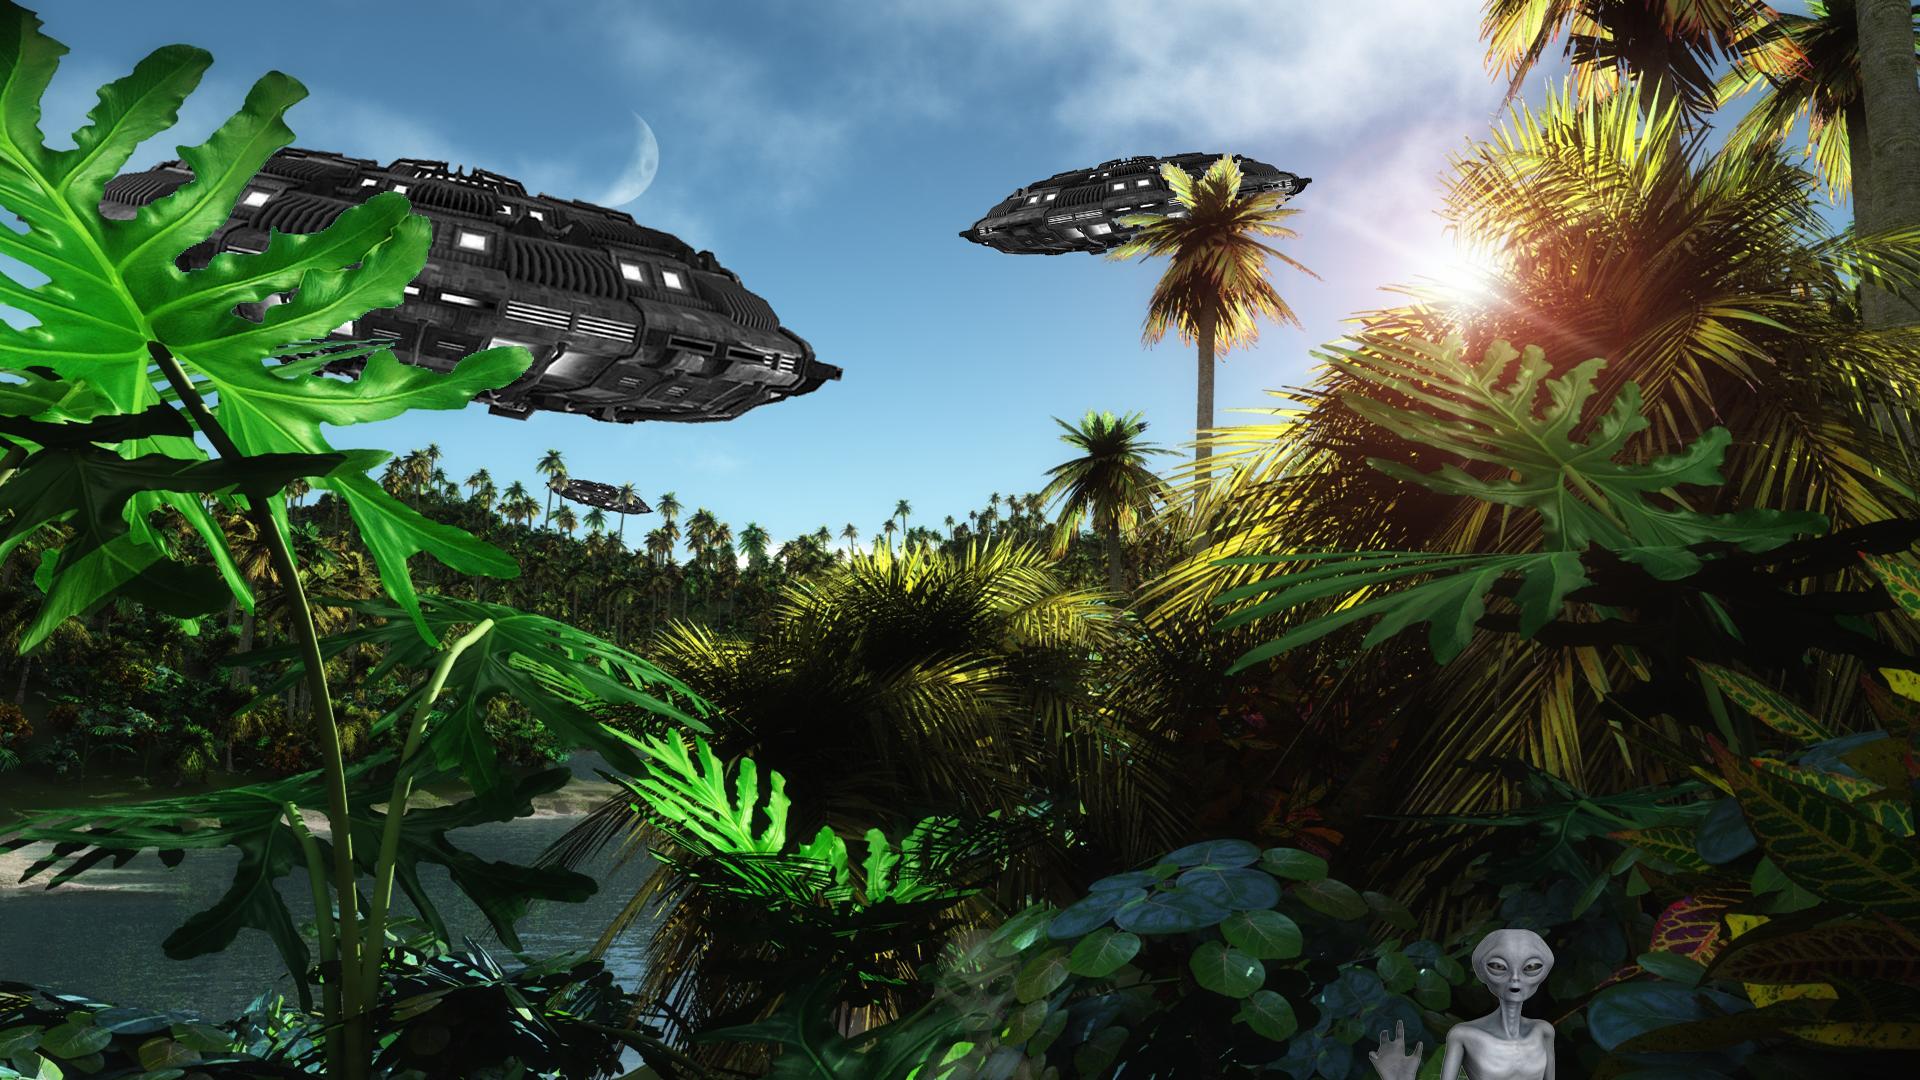 Galleryland Full HD UFO WallpaperAmazon Alien UFOspng 1920x1080